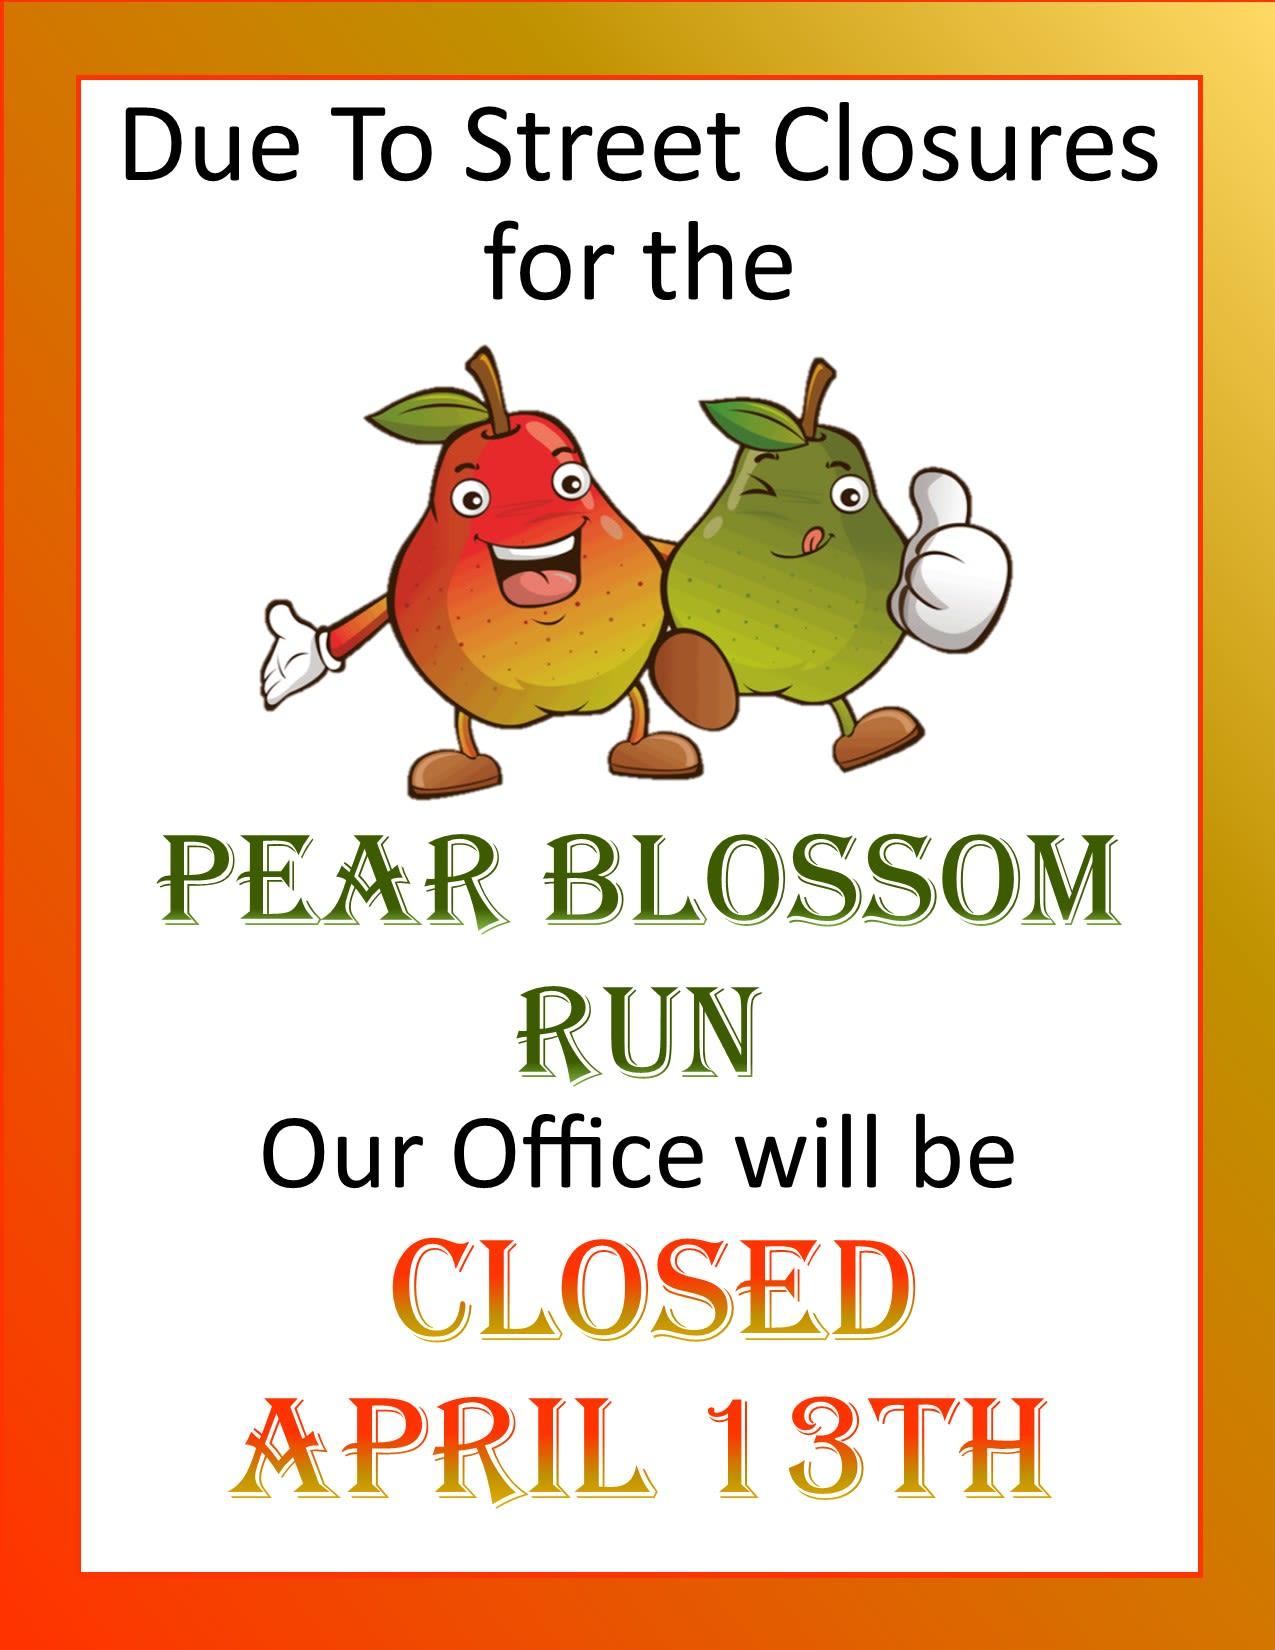 Pear Blossom Closure